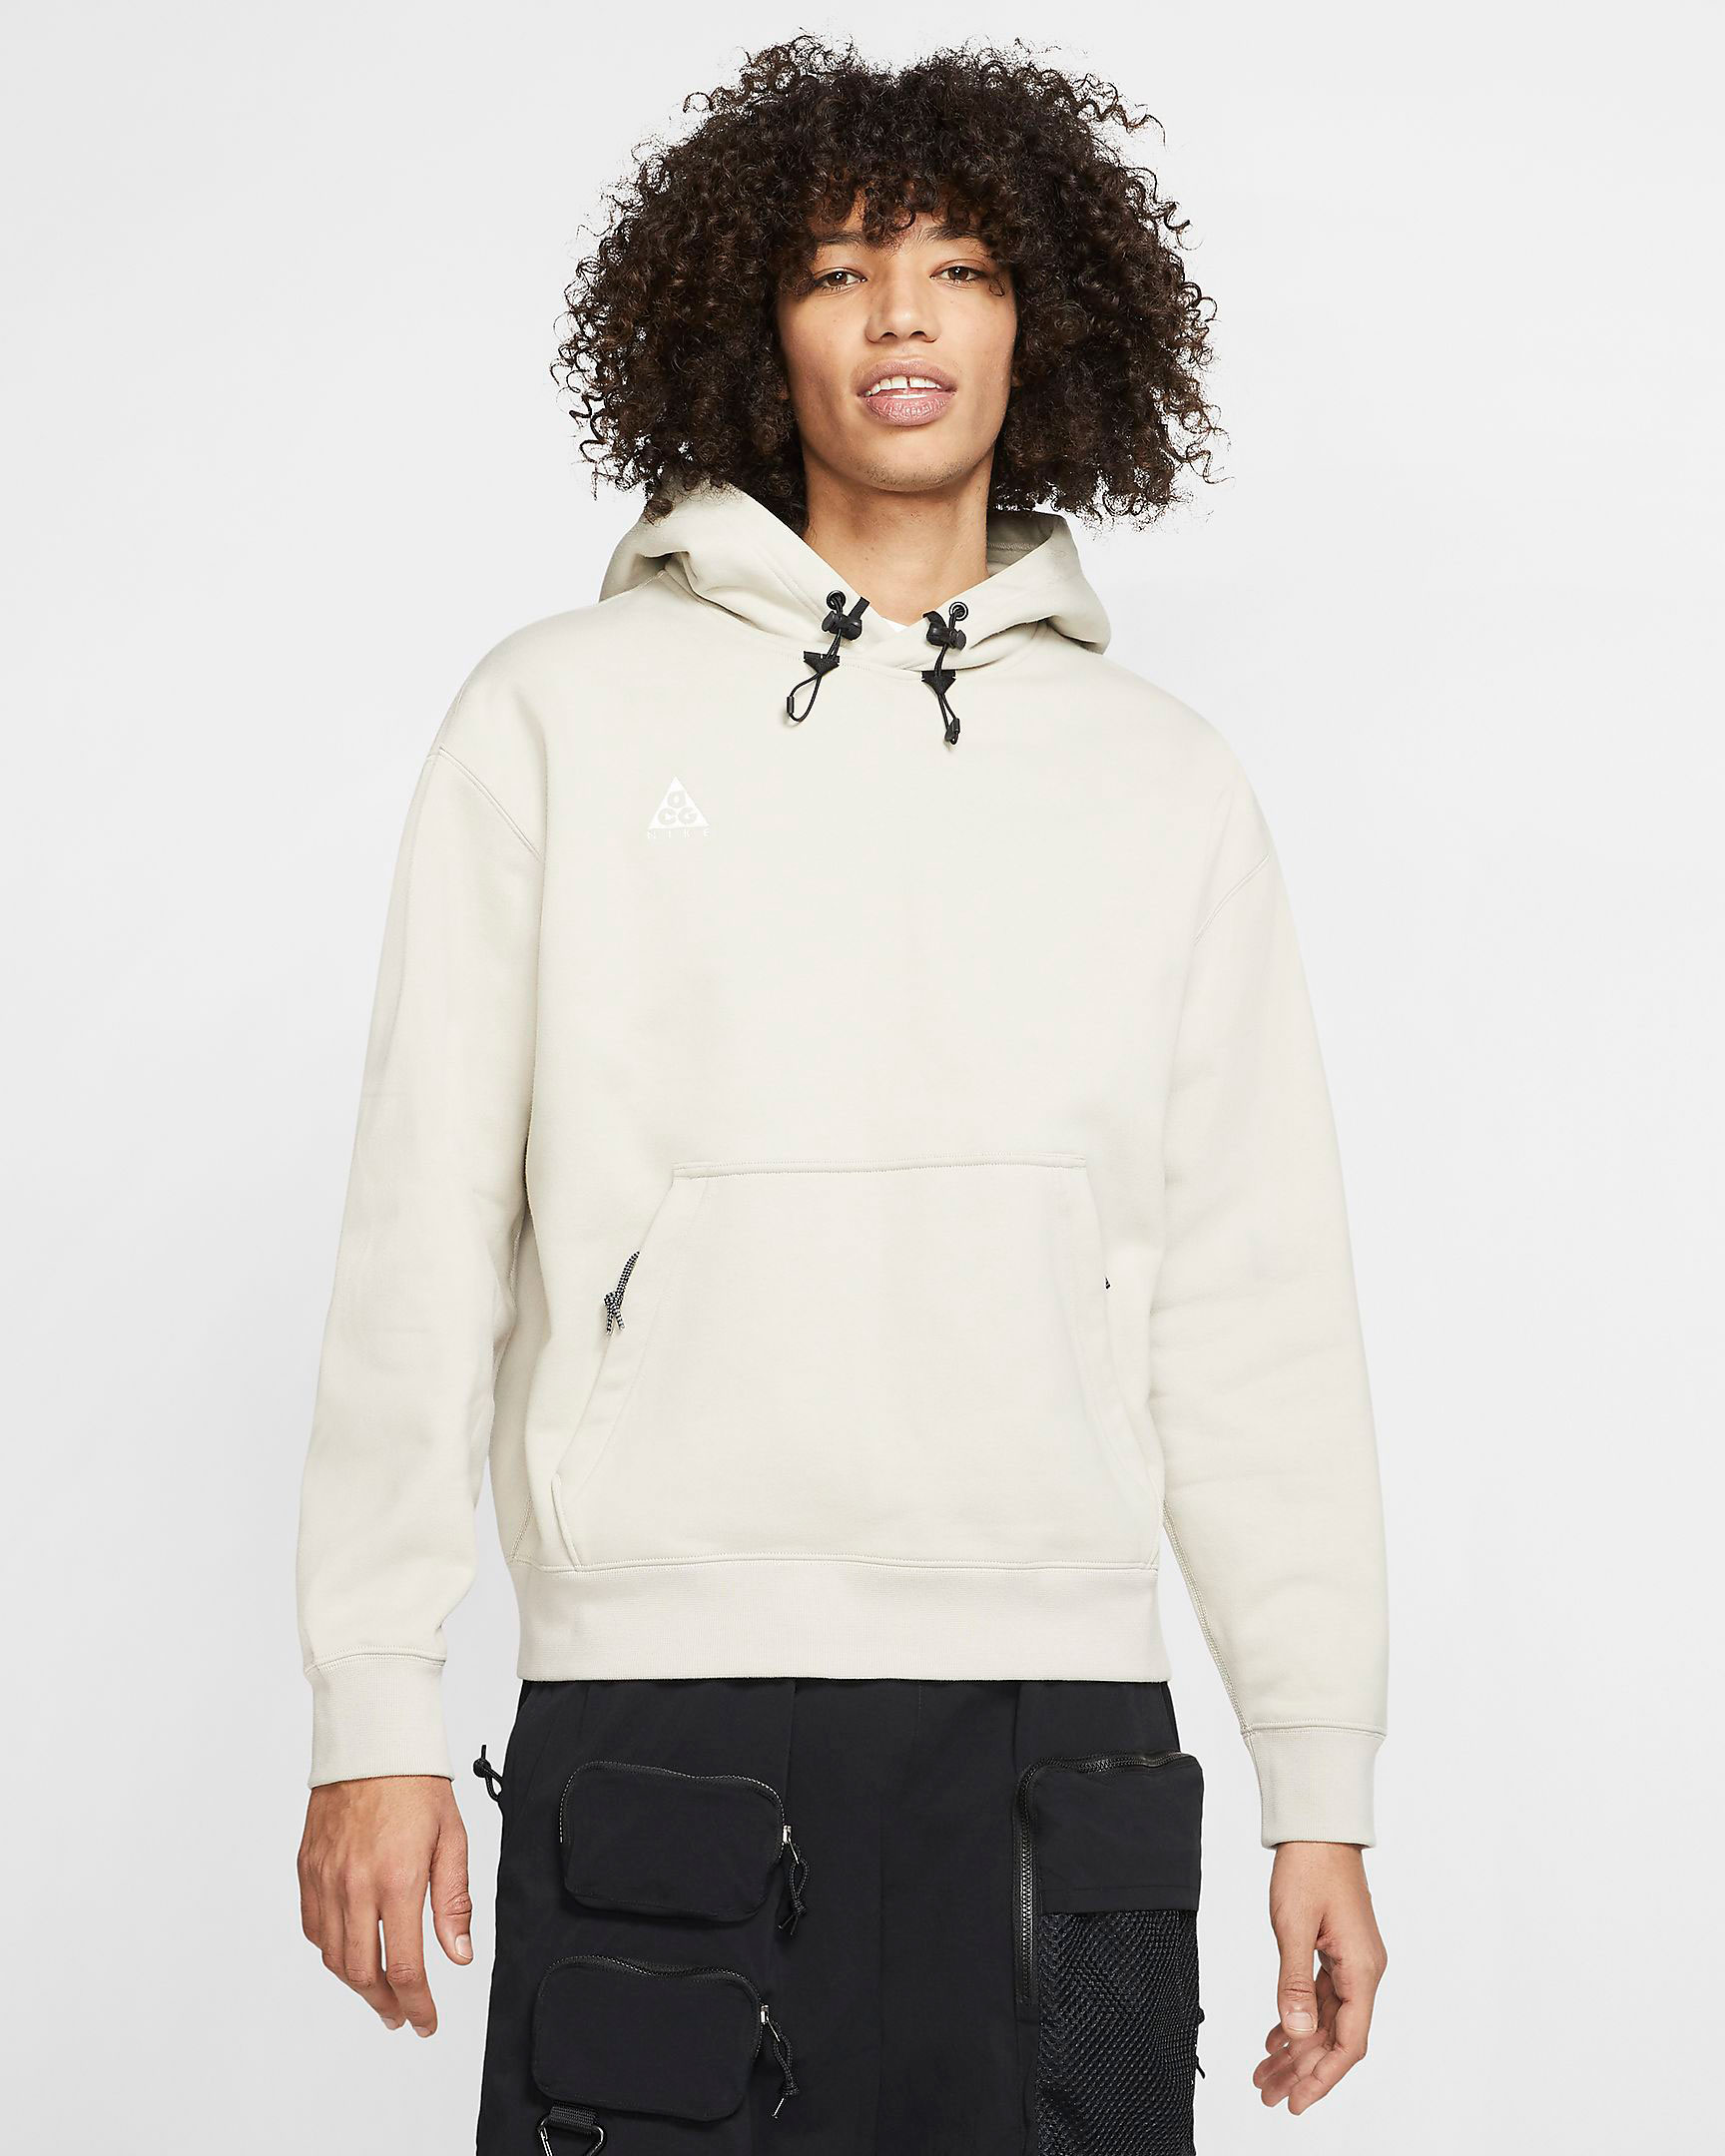 nike-acg-hoodie-sail